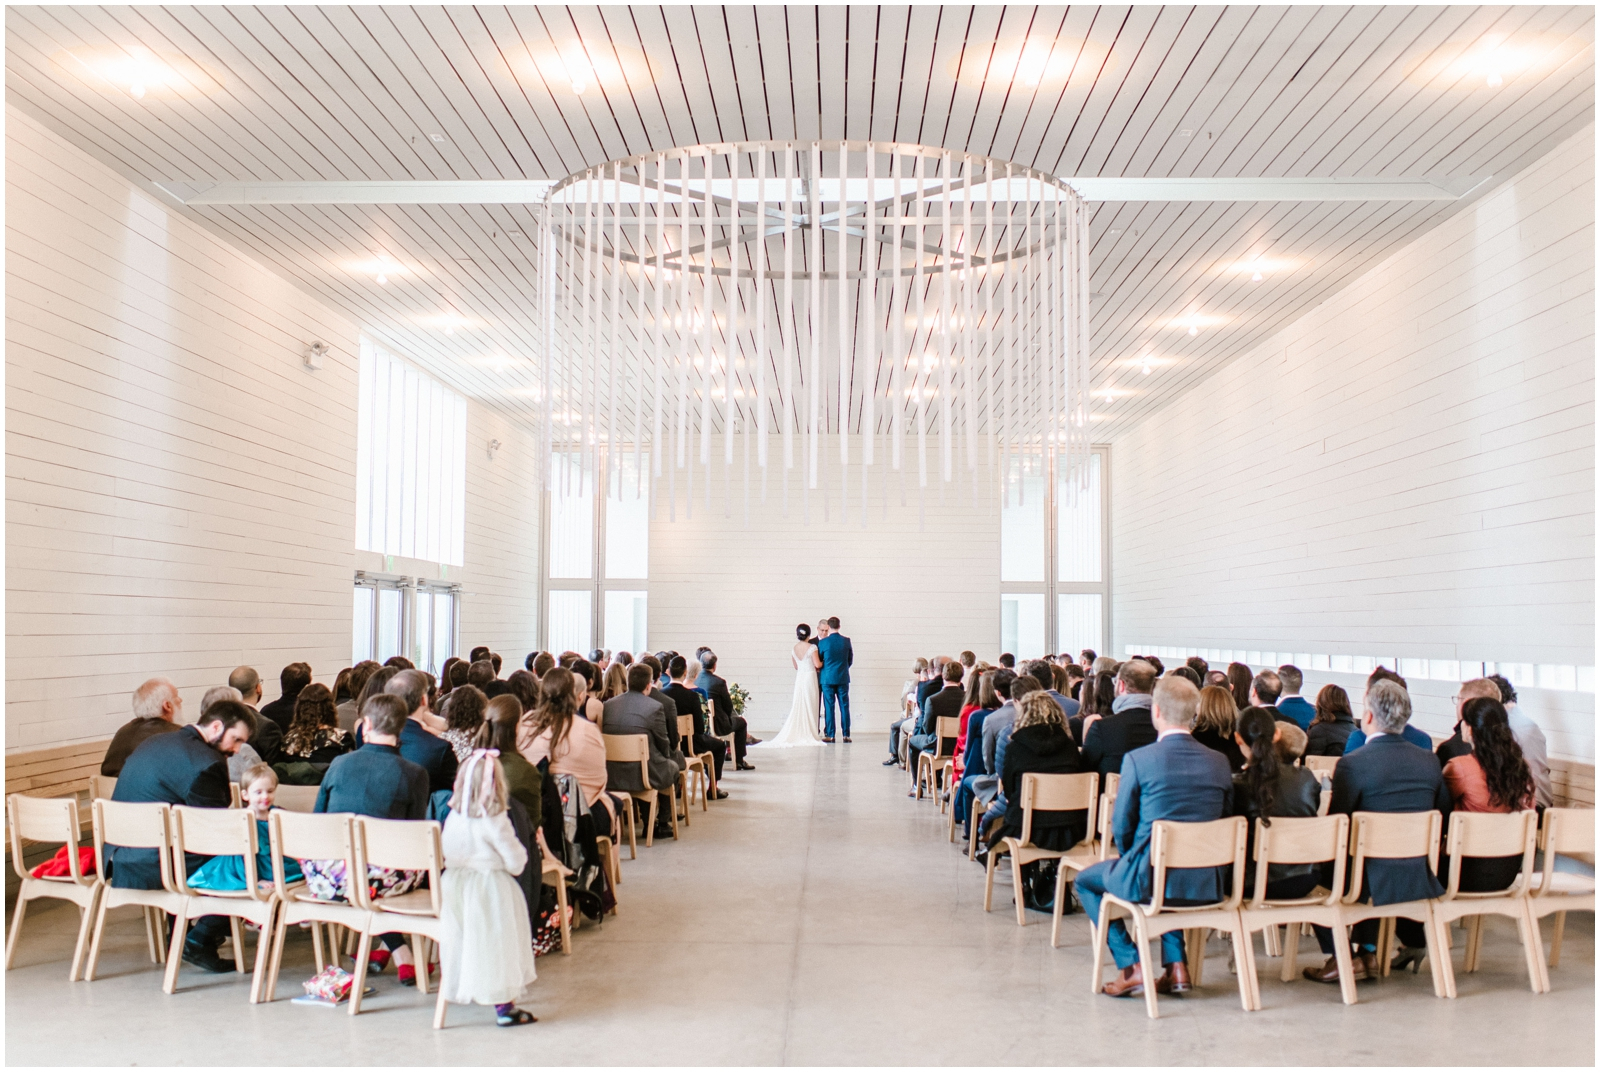 Minimalistic TX Venue Prosper House -Austin Wedding Planner_0343.jpg